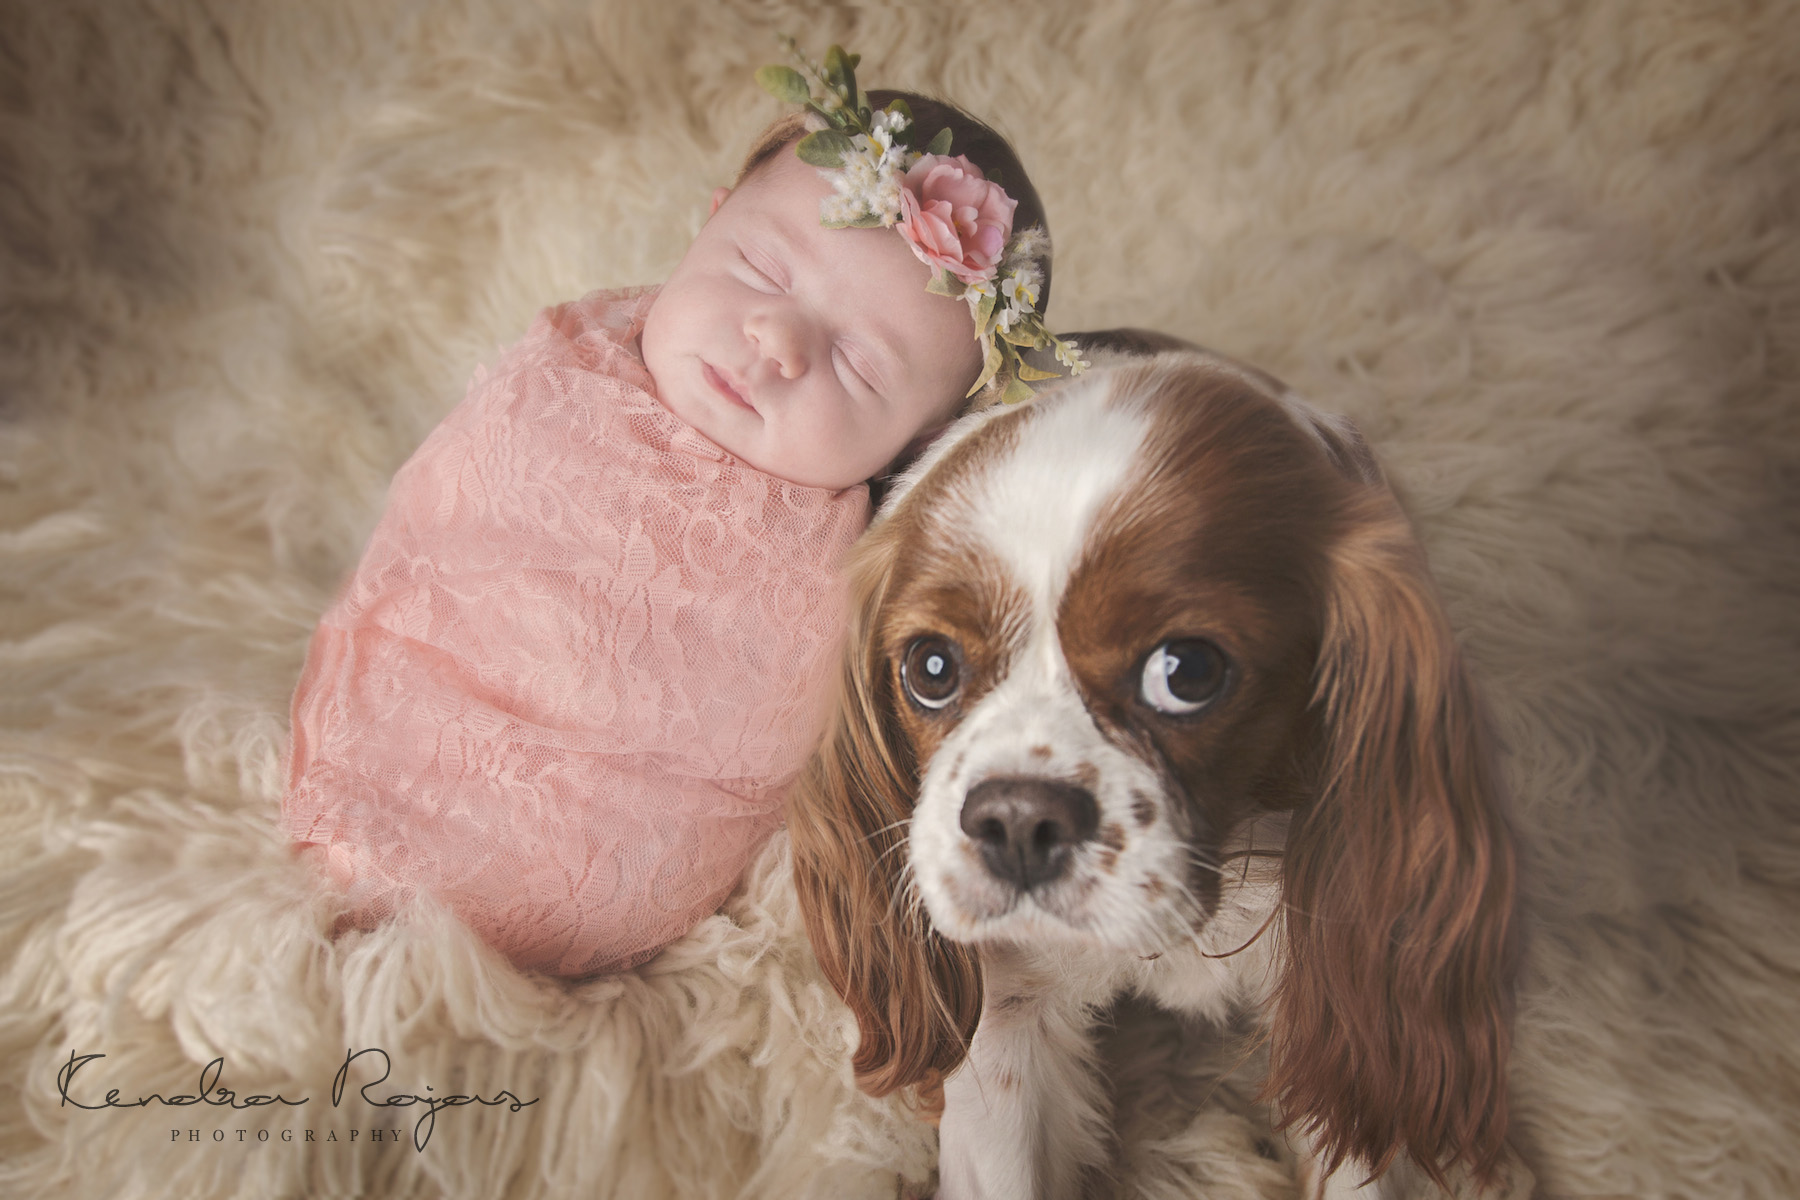 Newborn_Charlotte 112216_10_LOW_Social.jpg